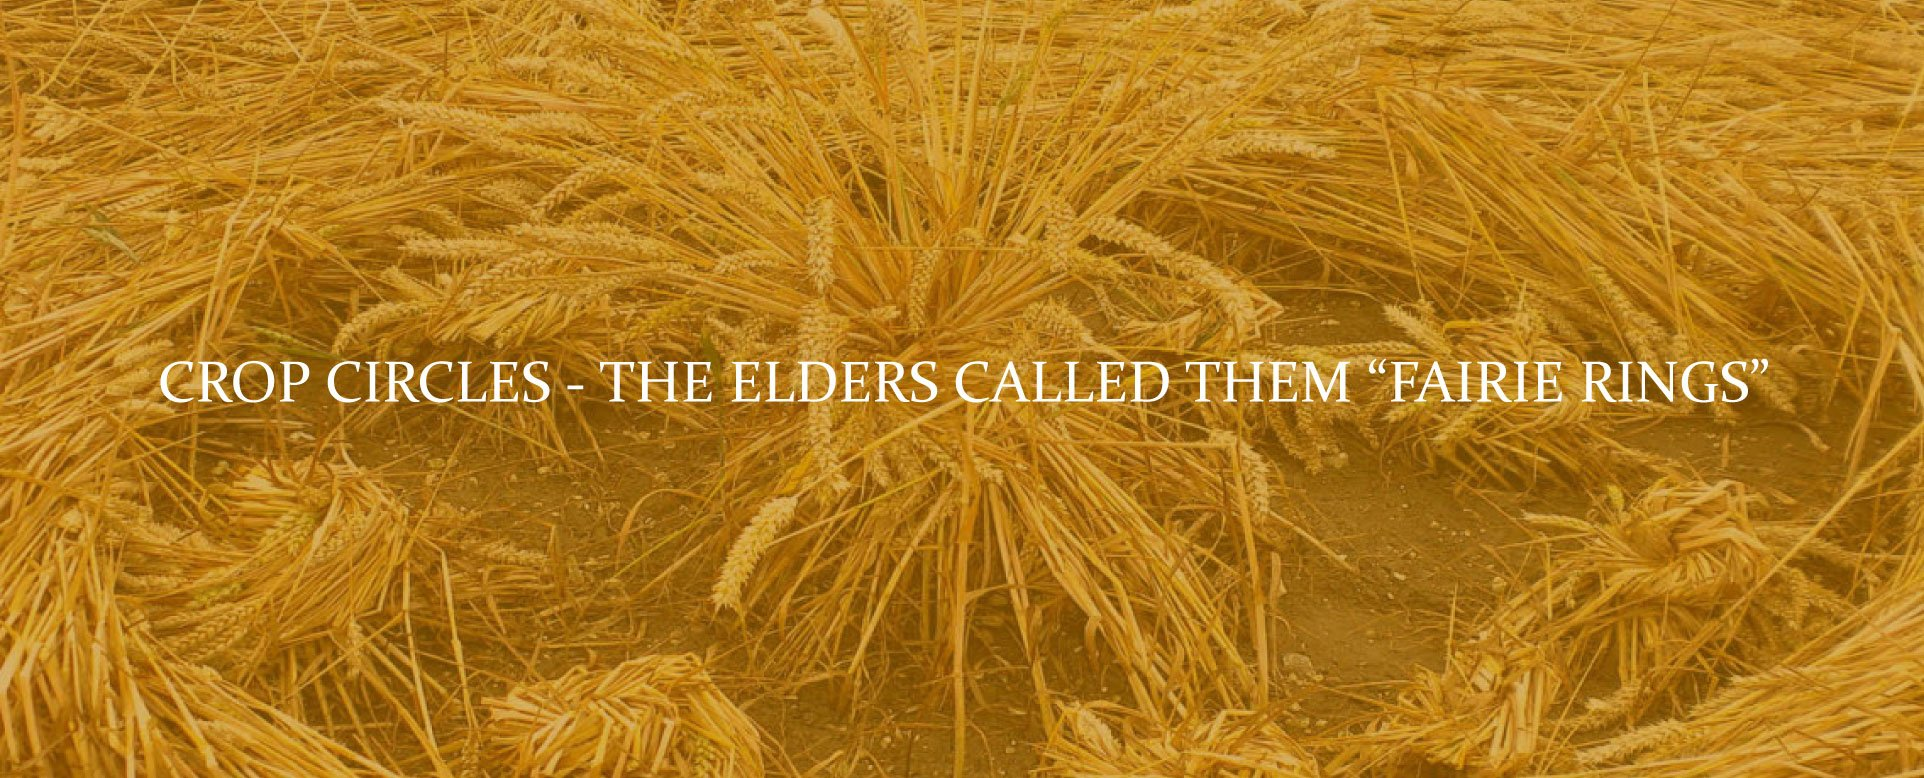 Crop Circles-The Elders Called Them Fairie Rings